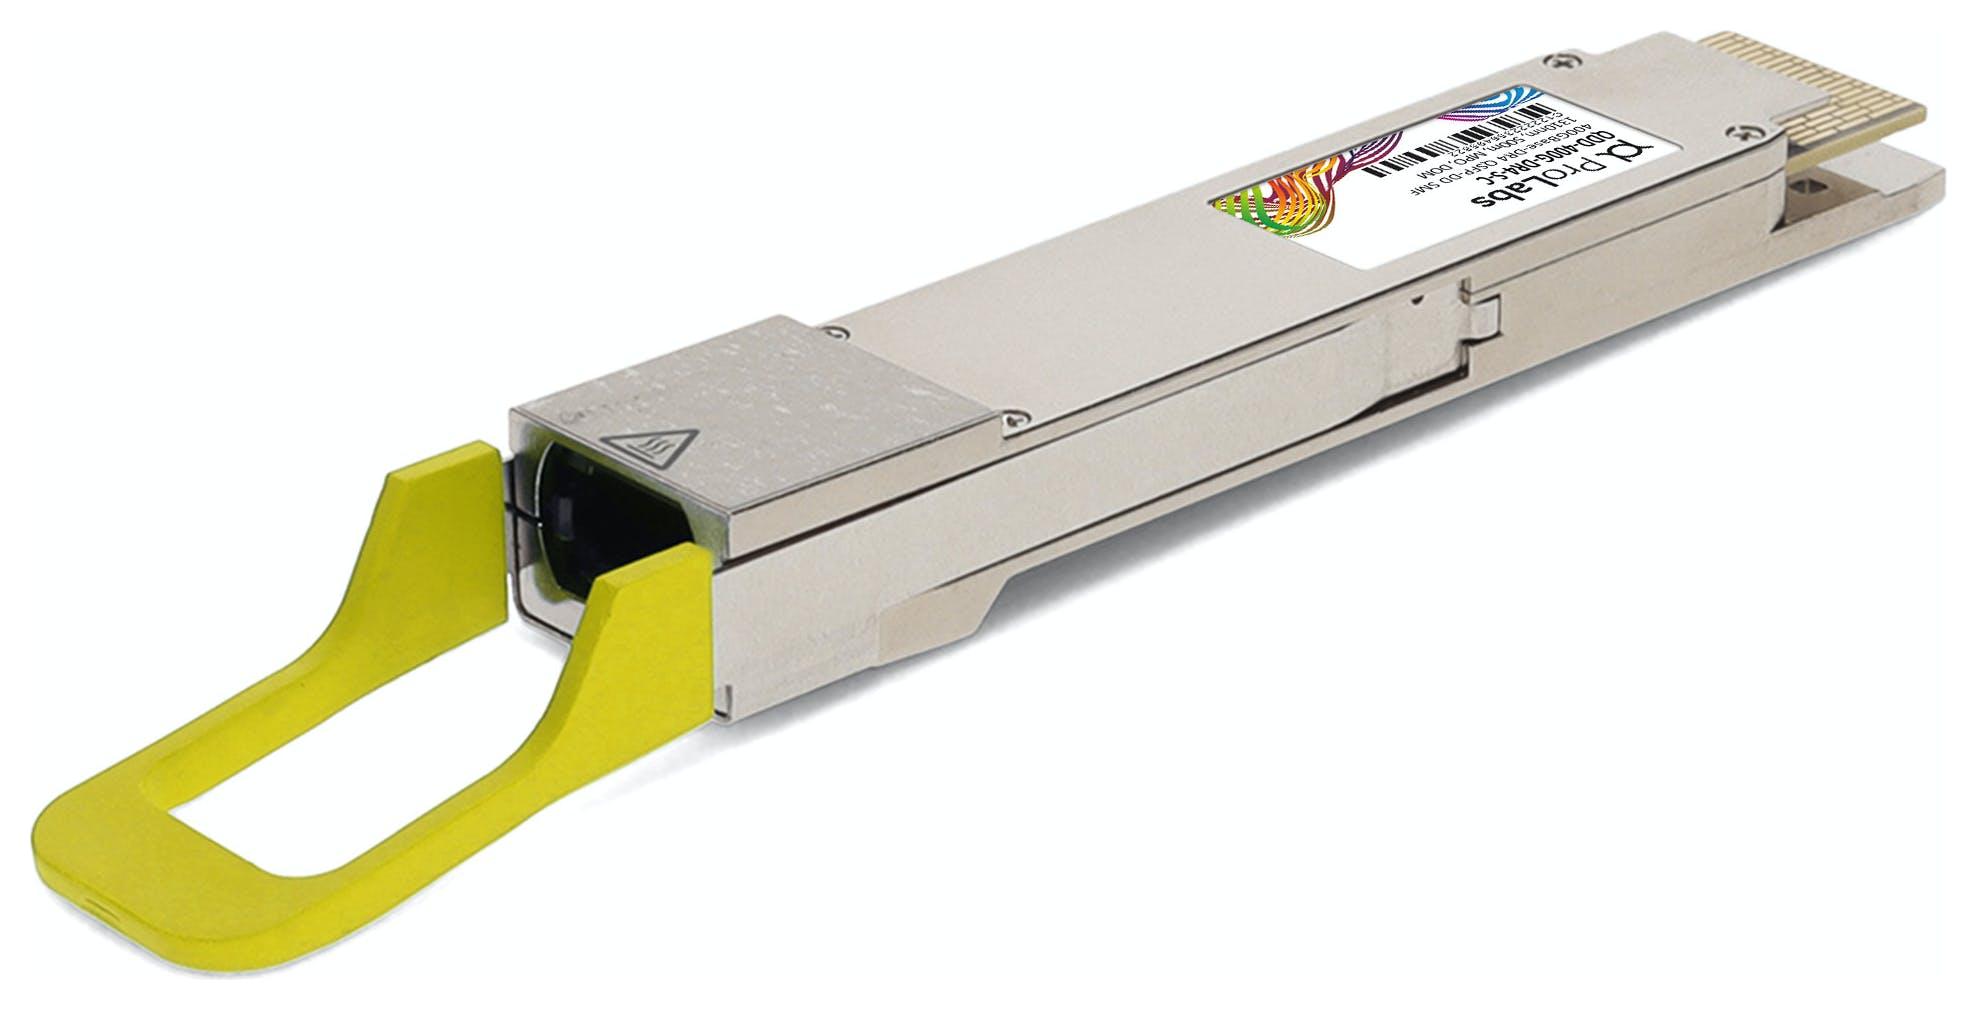 QSFP-DD Transciever from ProLabs